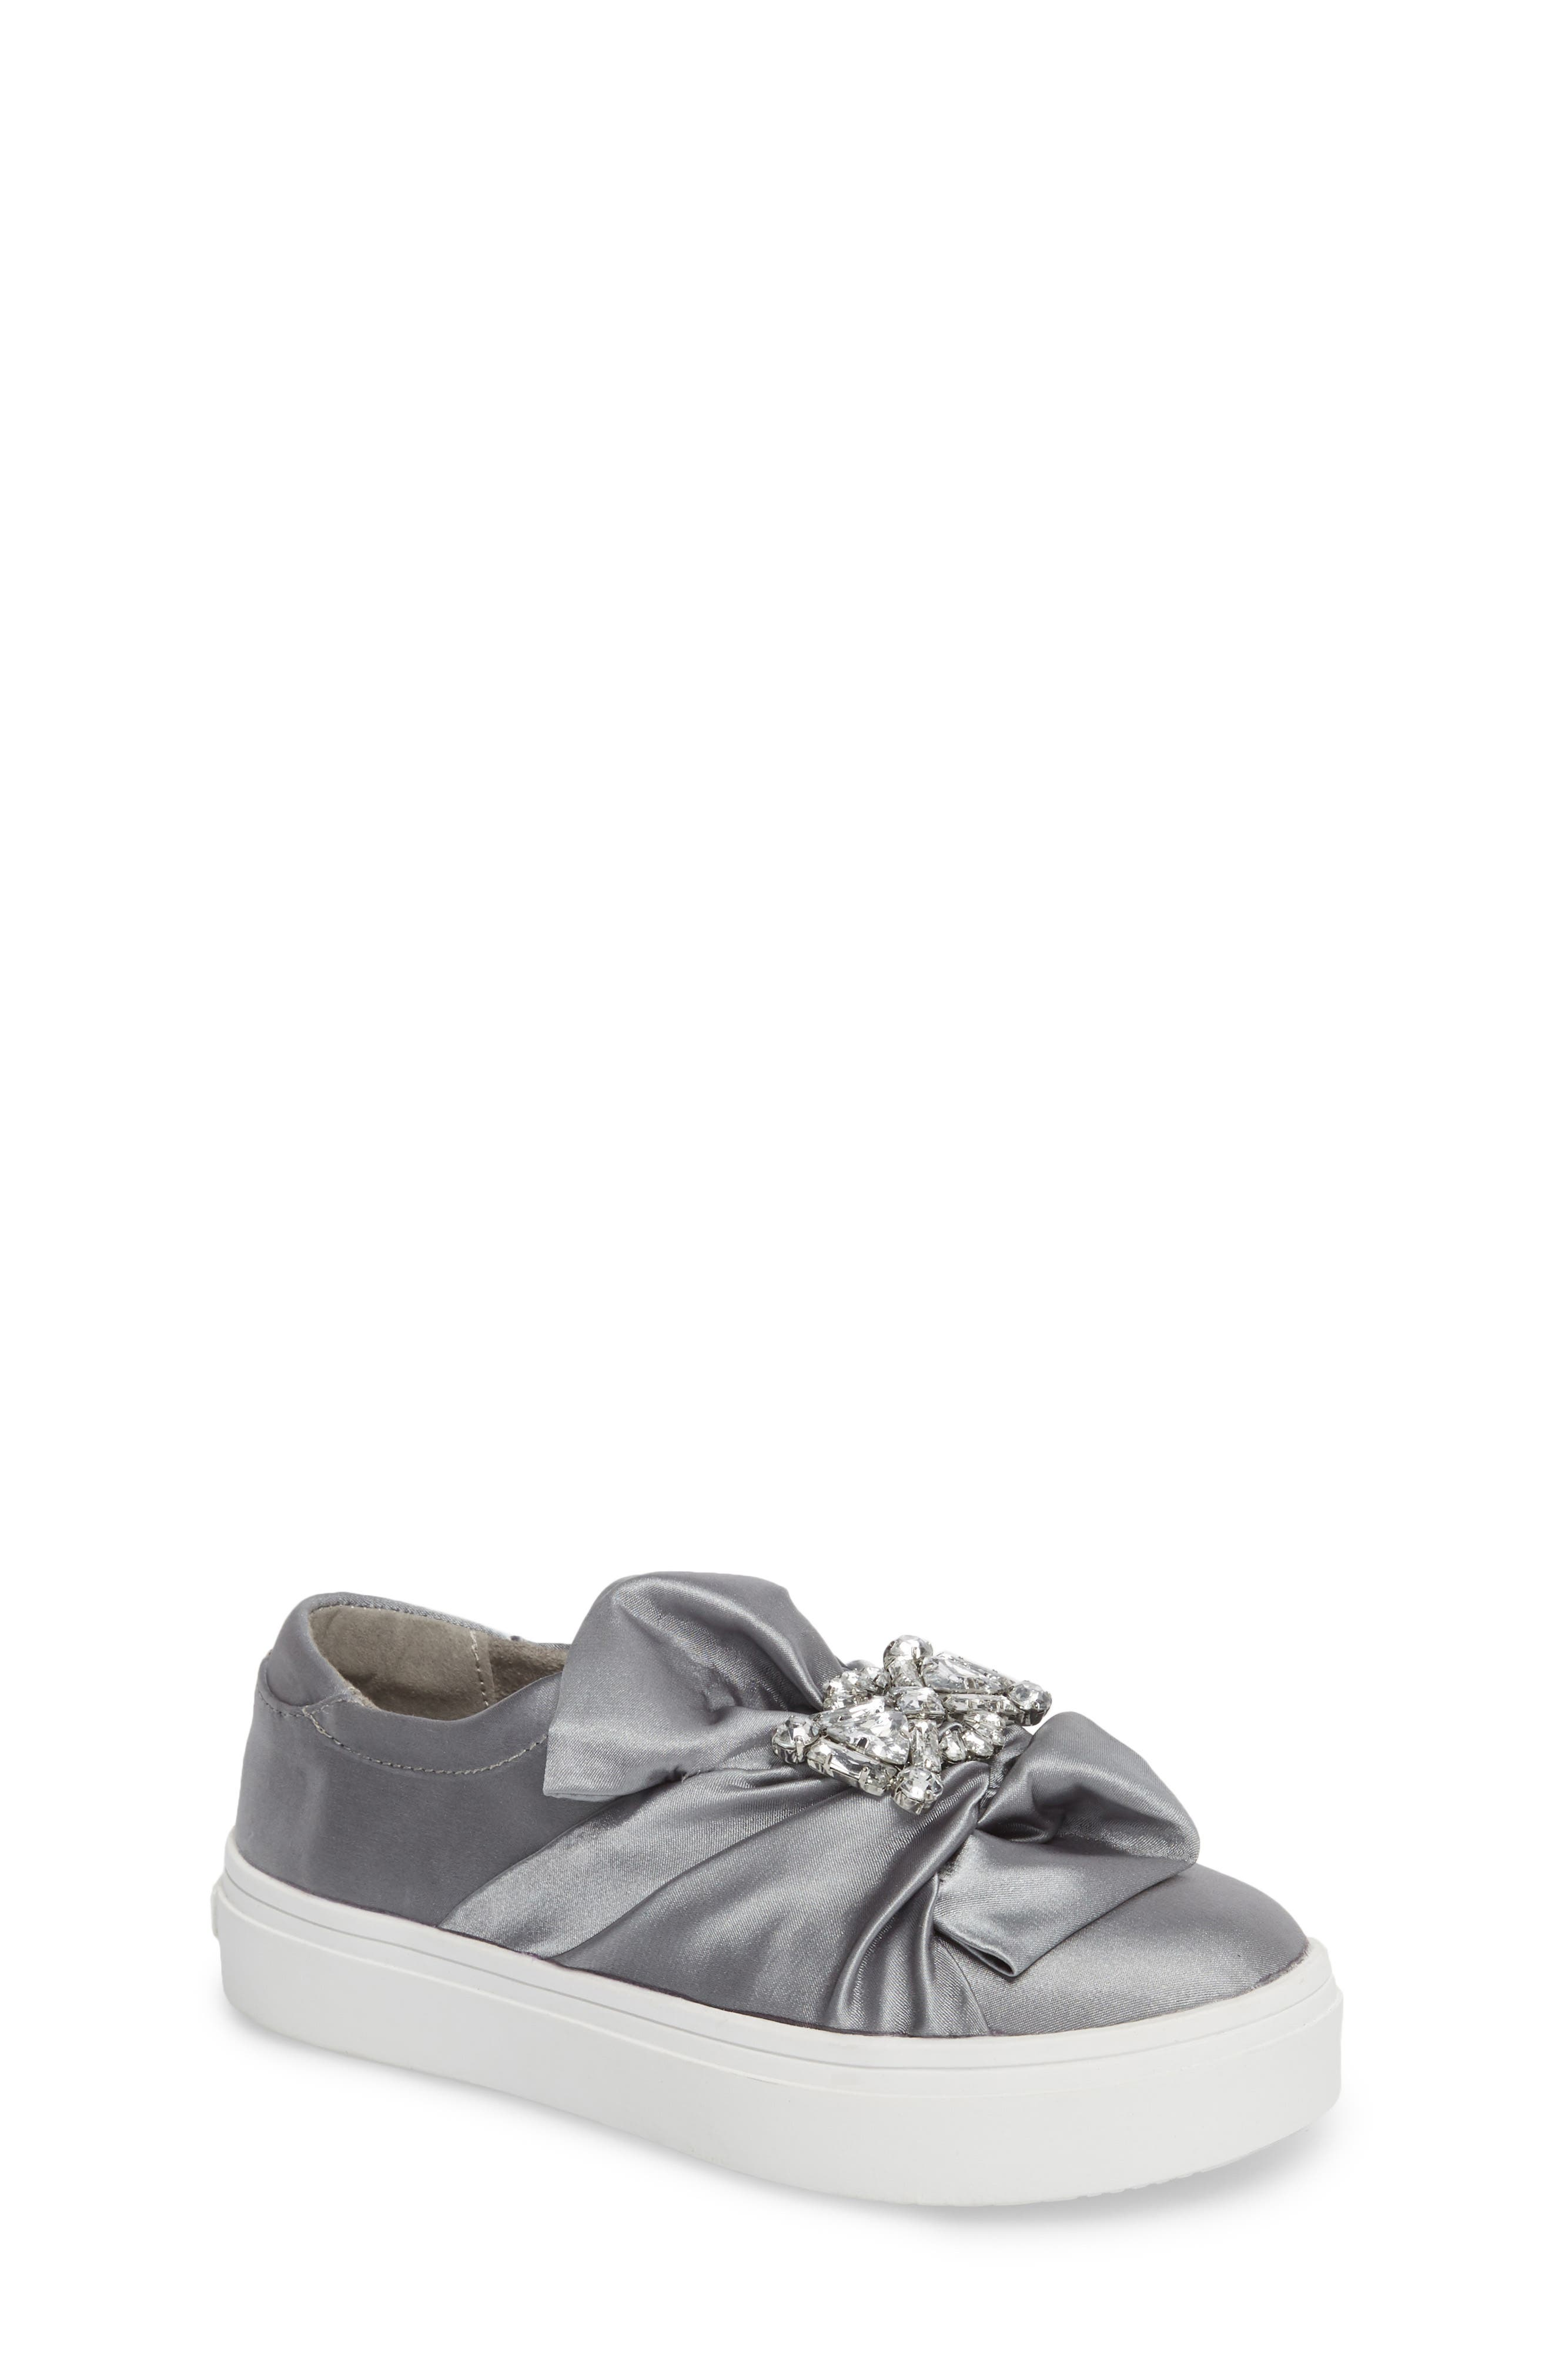 Shout Shine Embellished Sneaker,                         Main,                         color, Gray